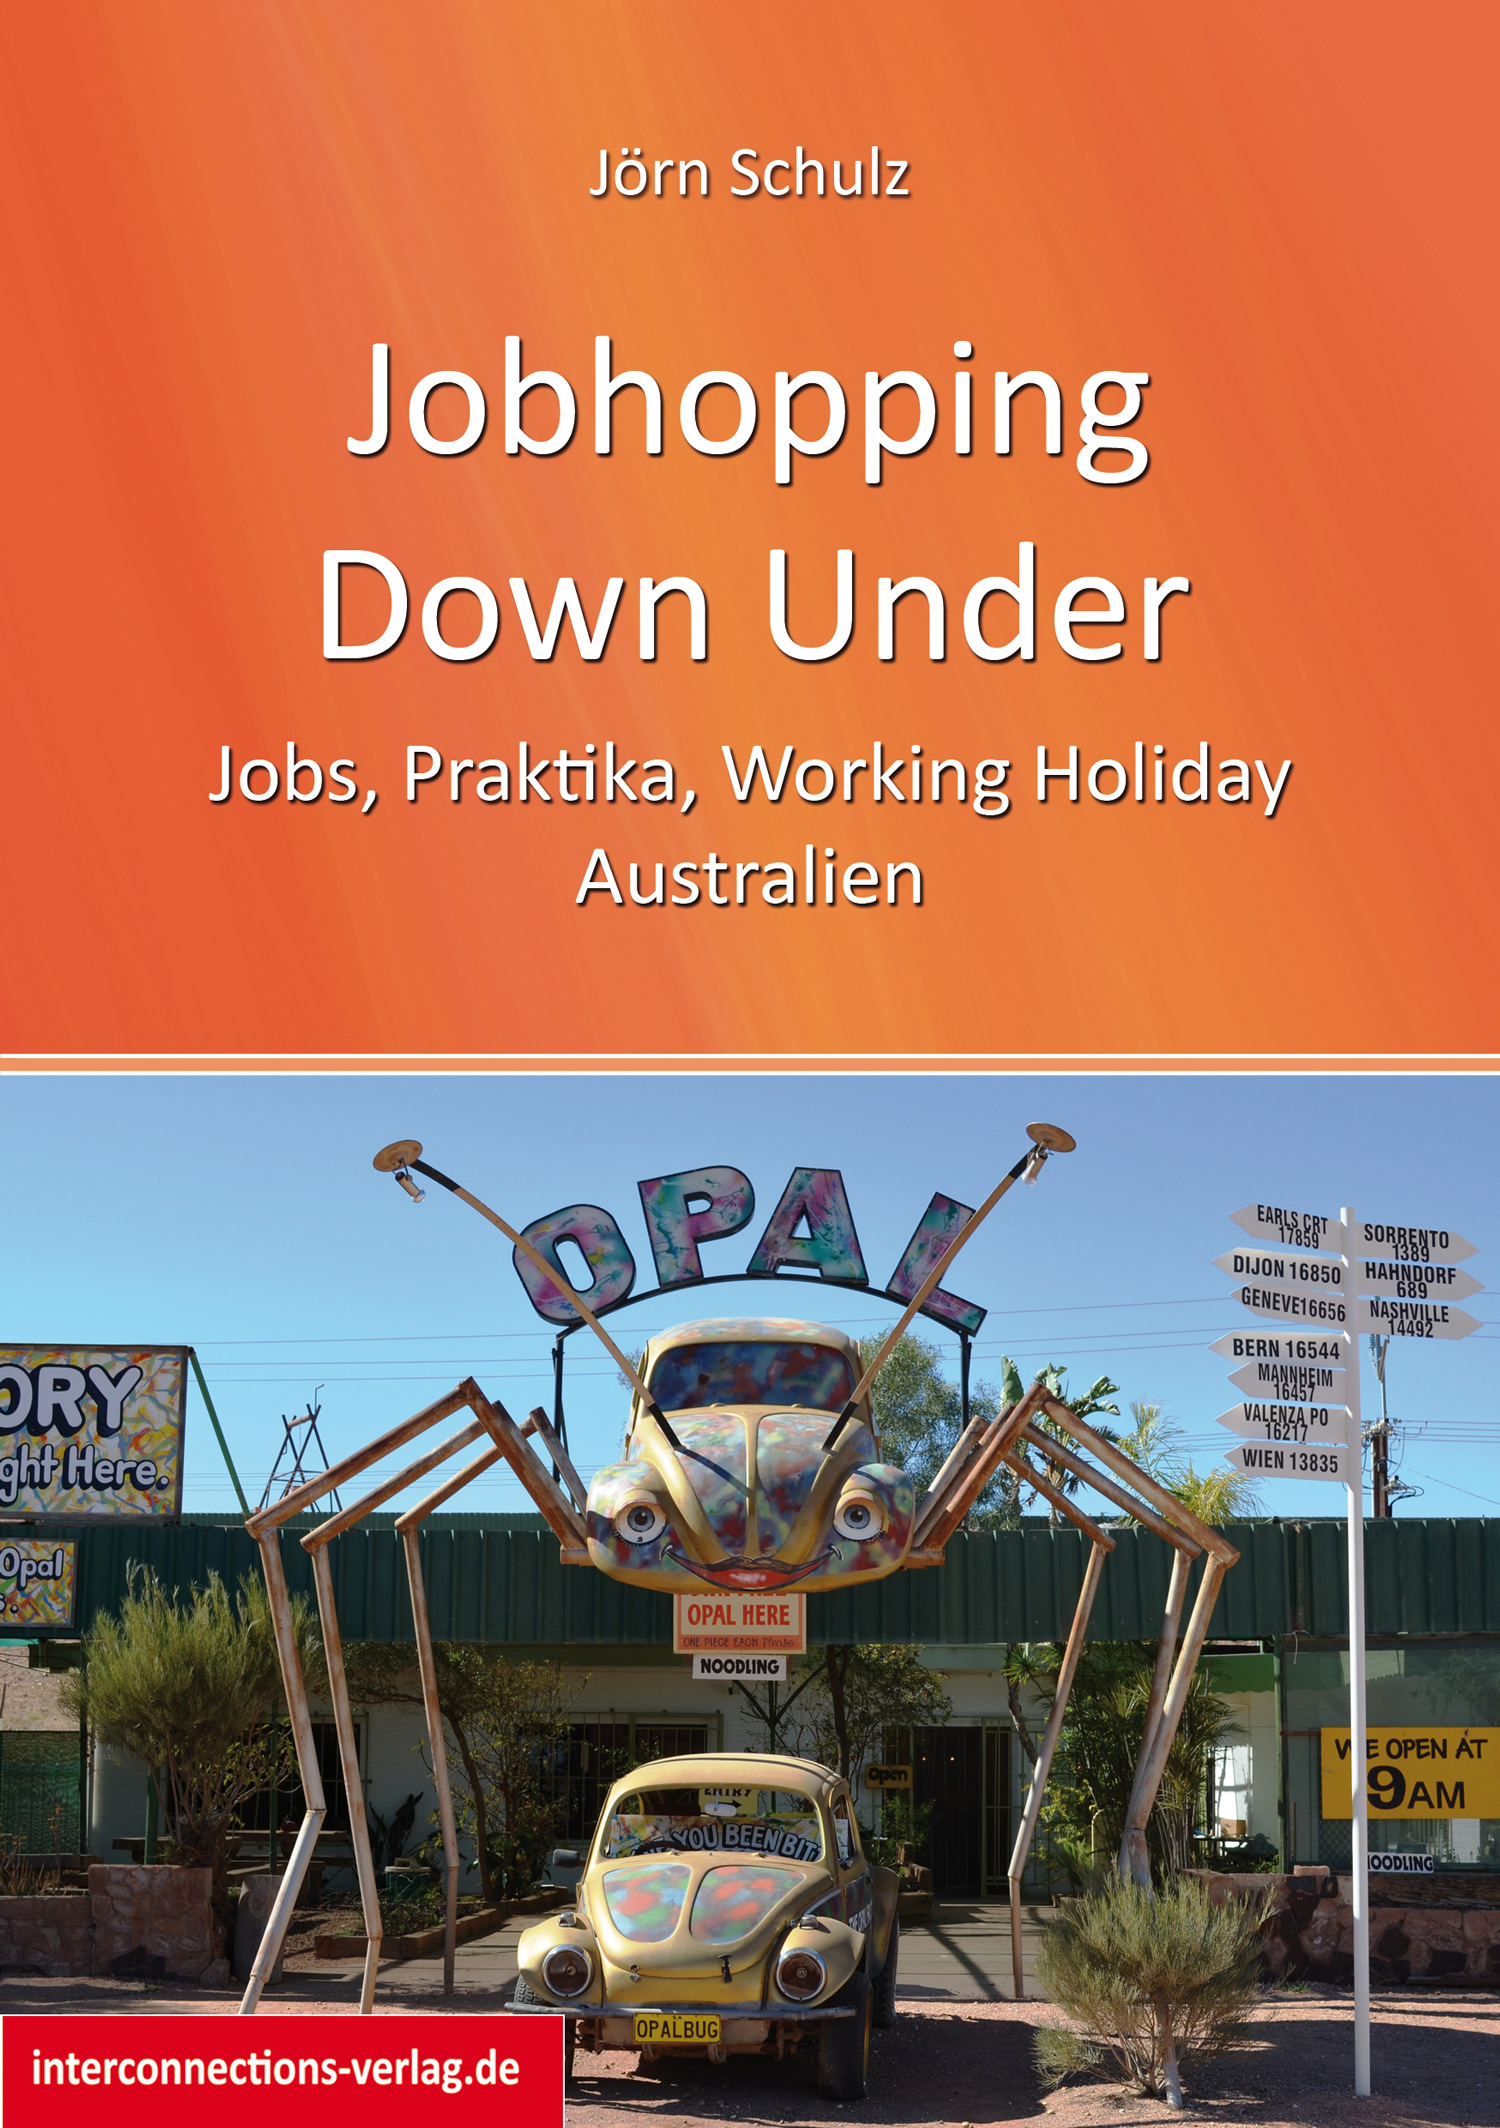 Jobhopping Down Under - Jobs, Praktika, Working...